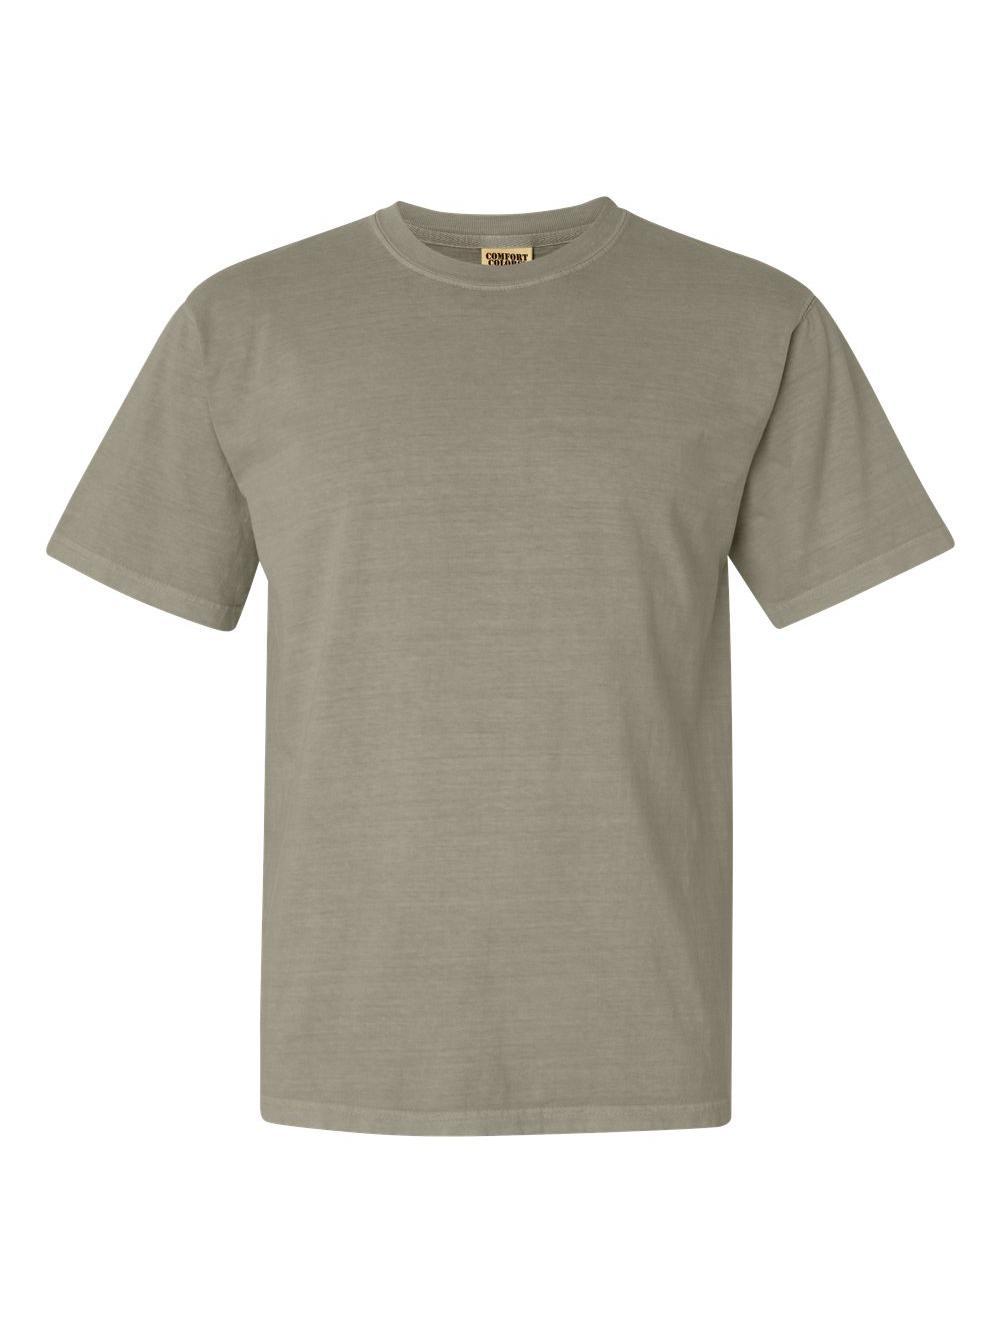 Comfort-Colors-Garment-Dyed-Heavyweight-Ringspun-Short-Sleeve-Shirt-1717 thumbnail 114